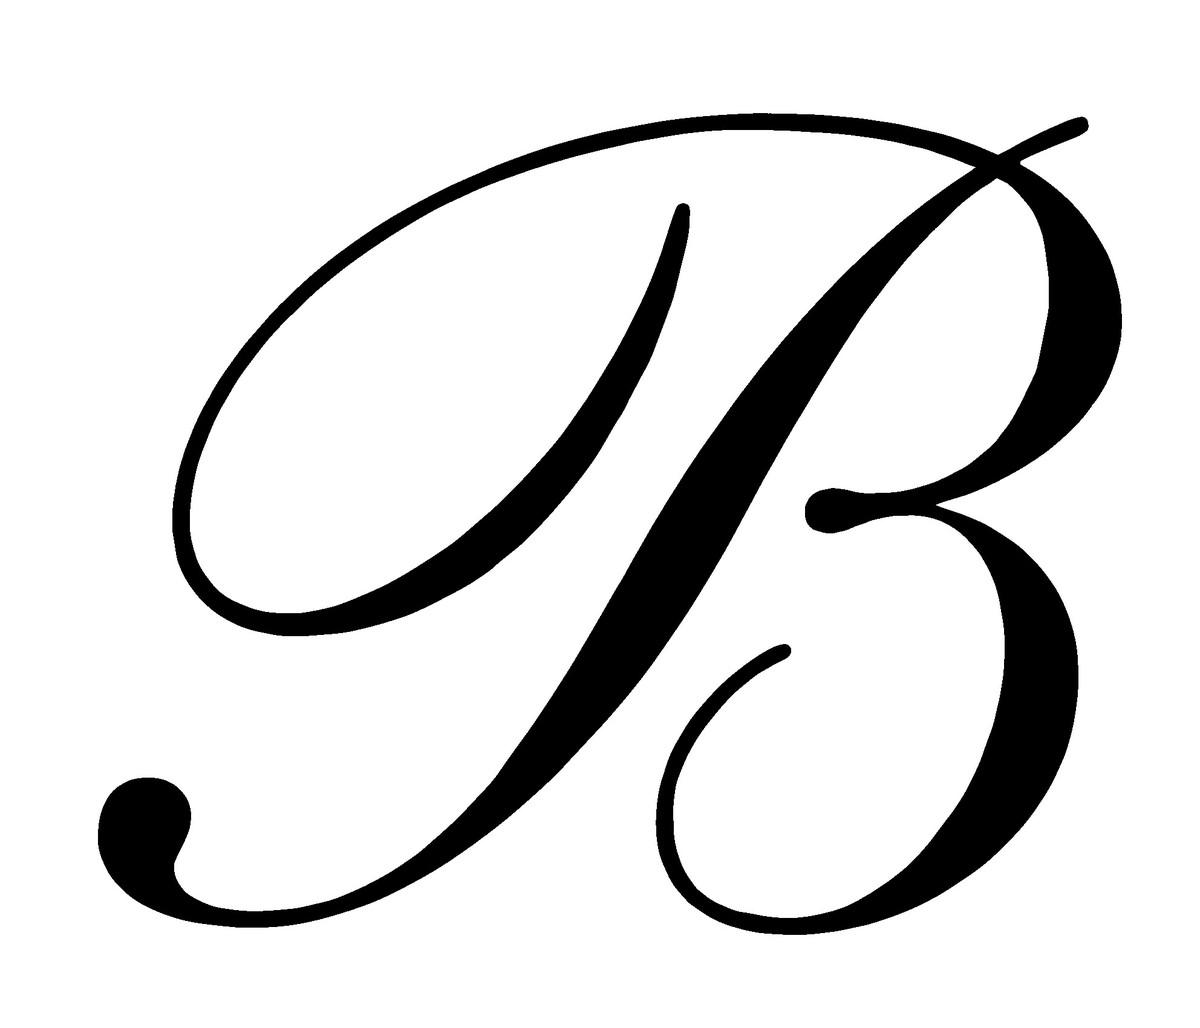 Lowercase Cursive Alphabet Writing